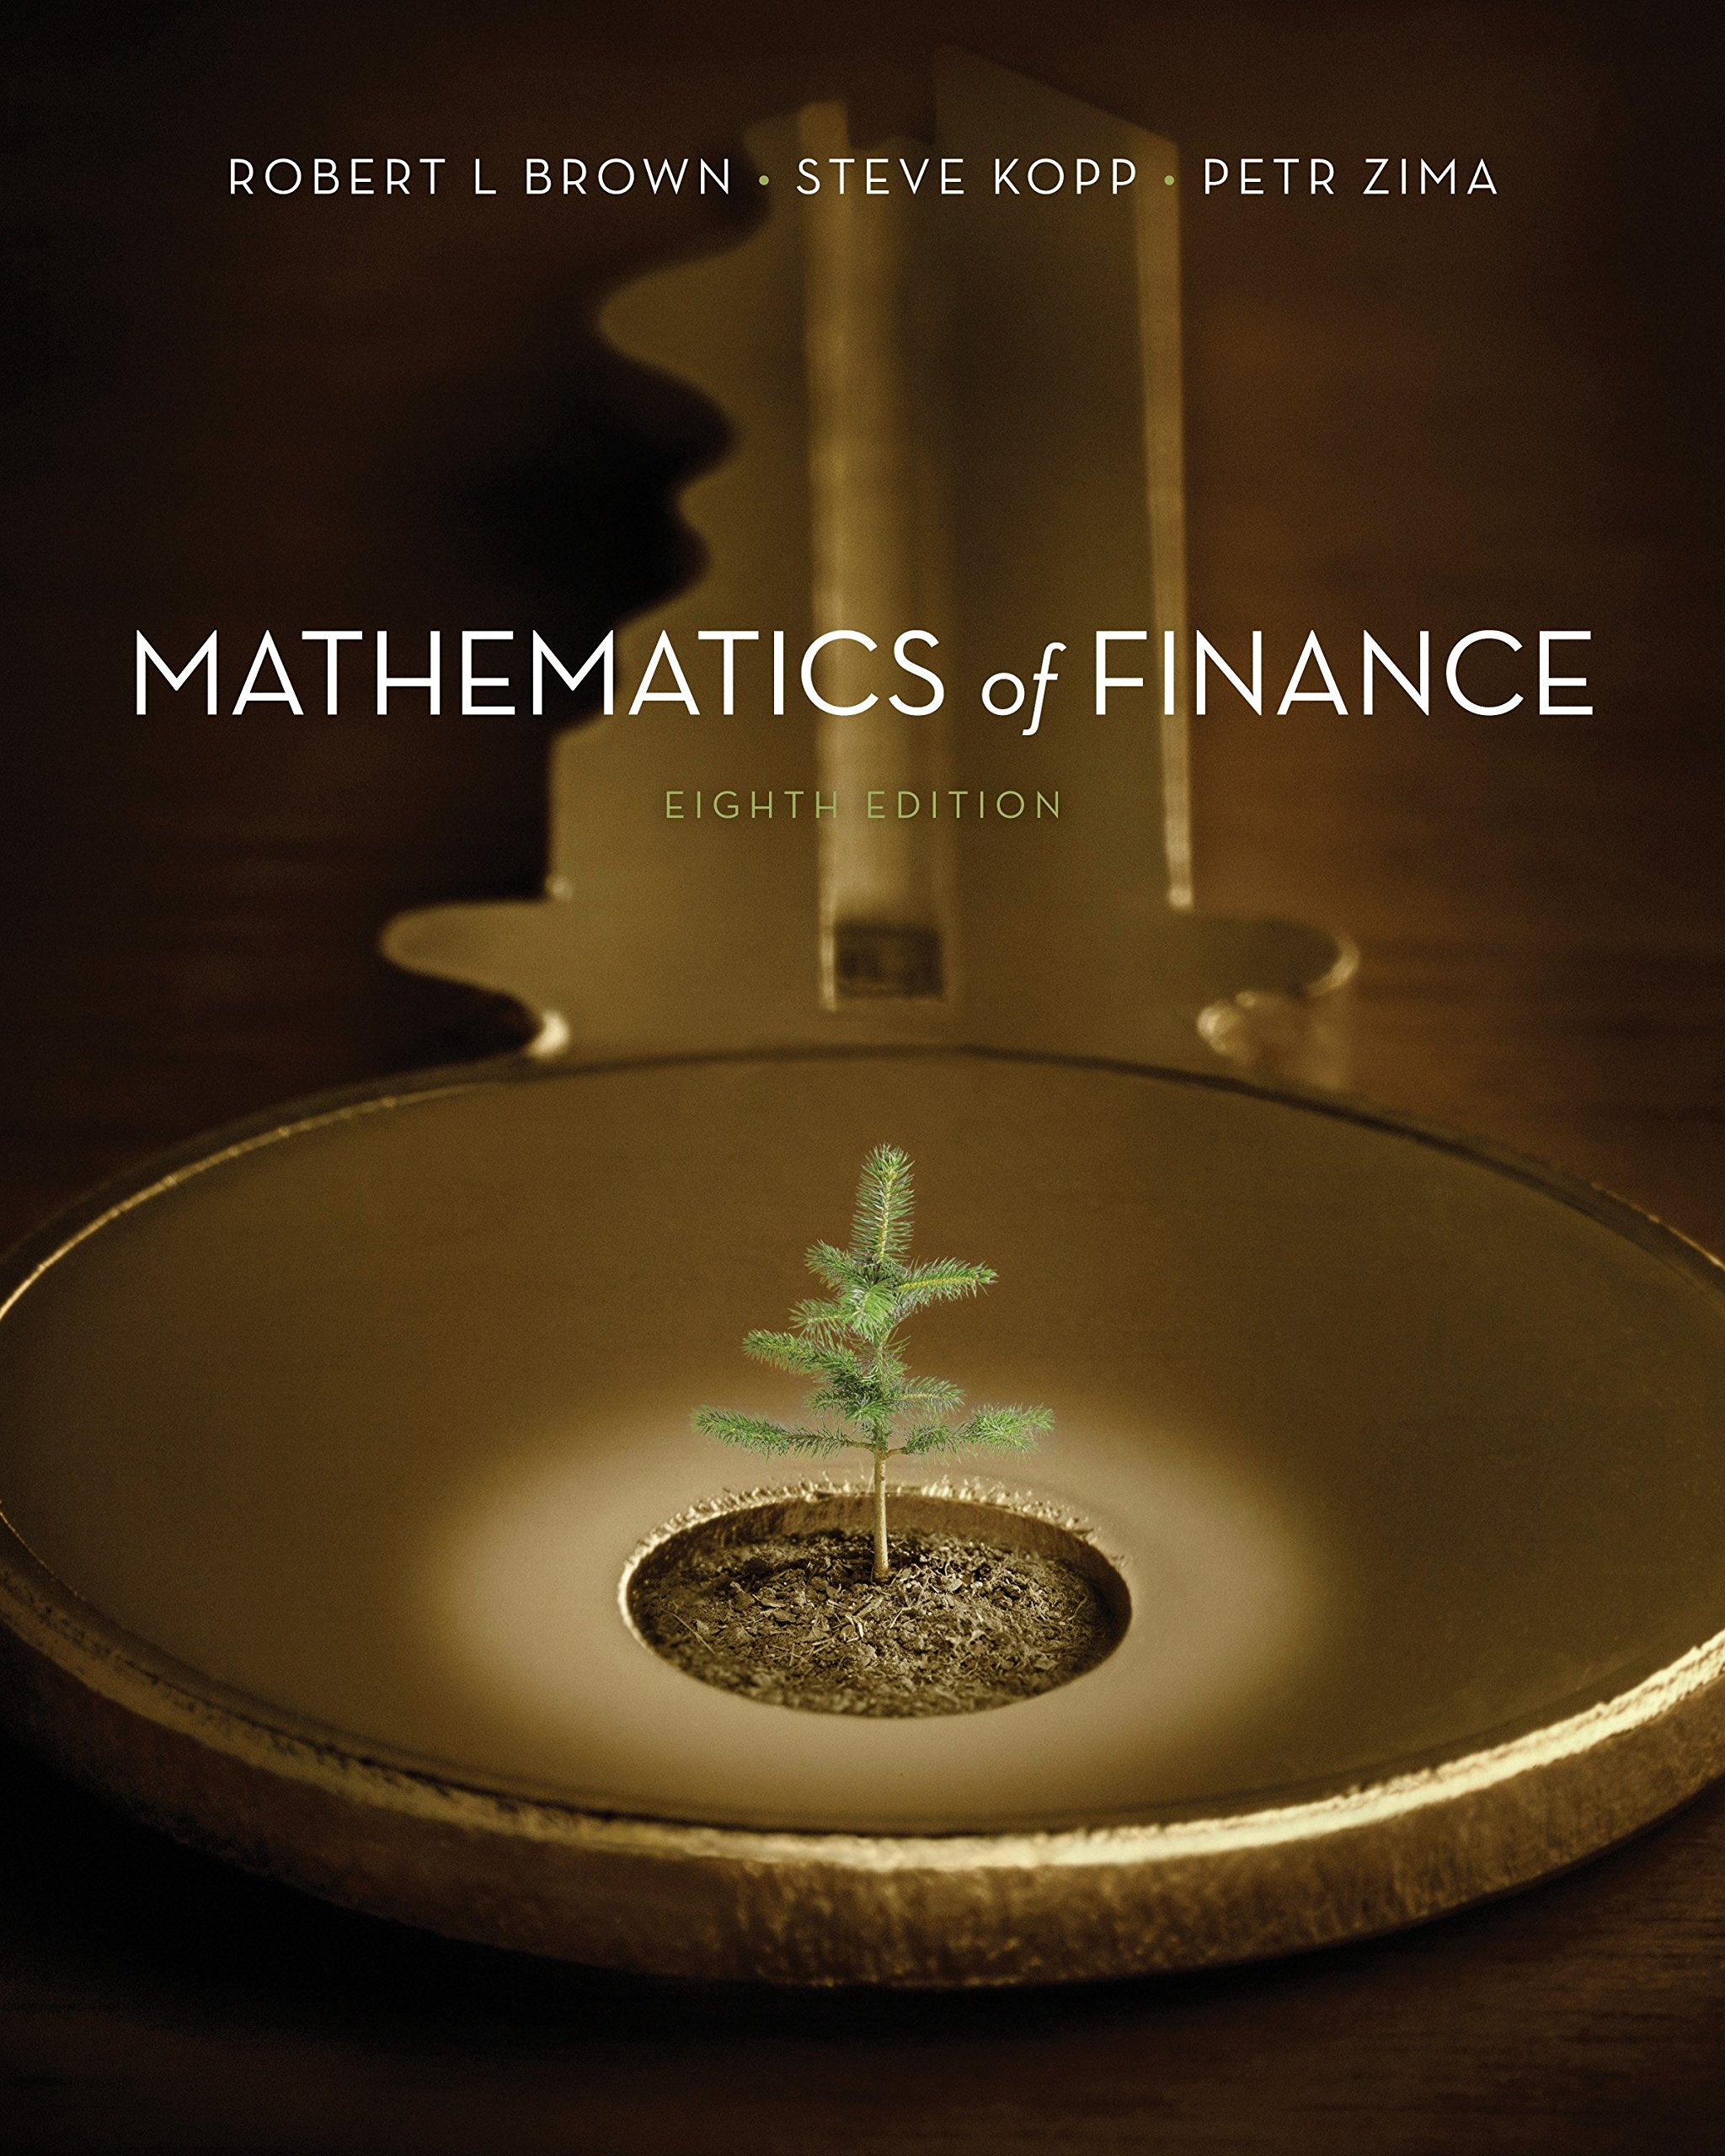 Mathematics of Finance, Eighth Edition